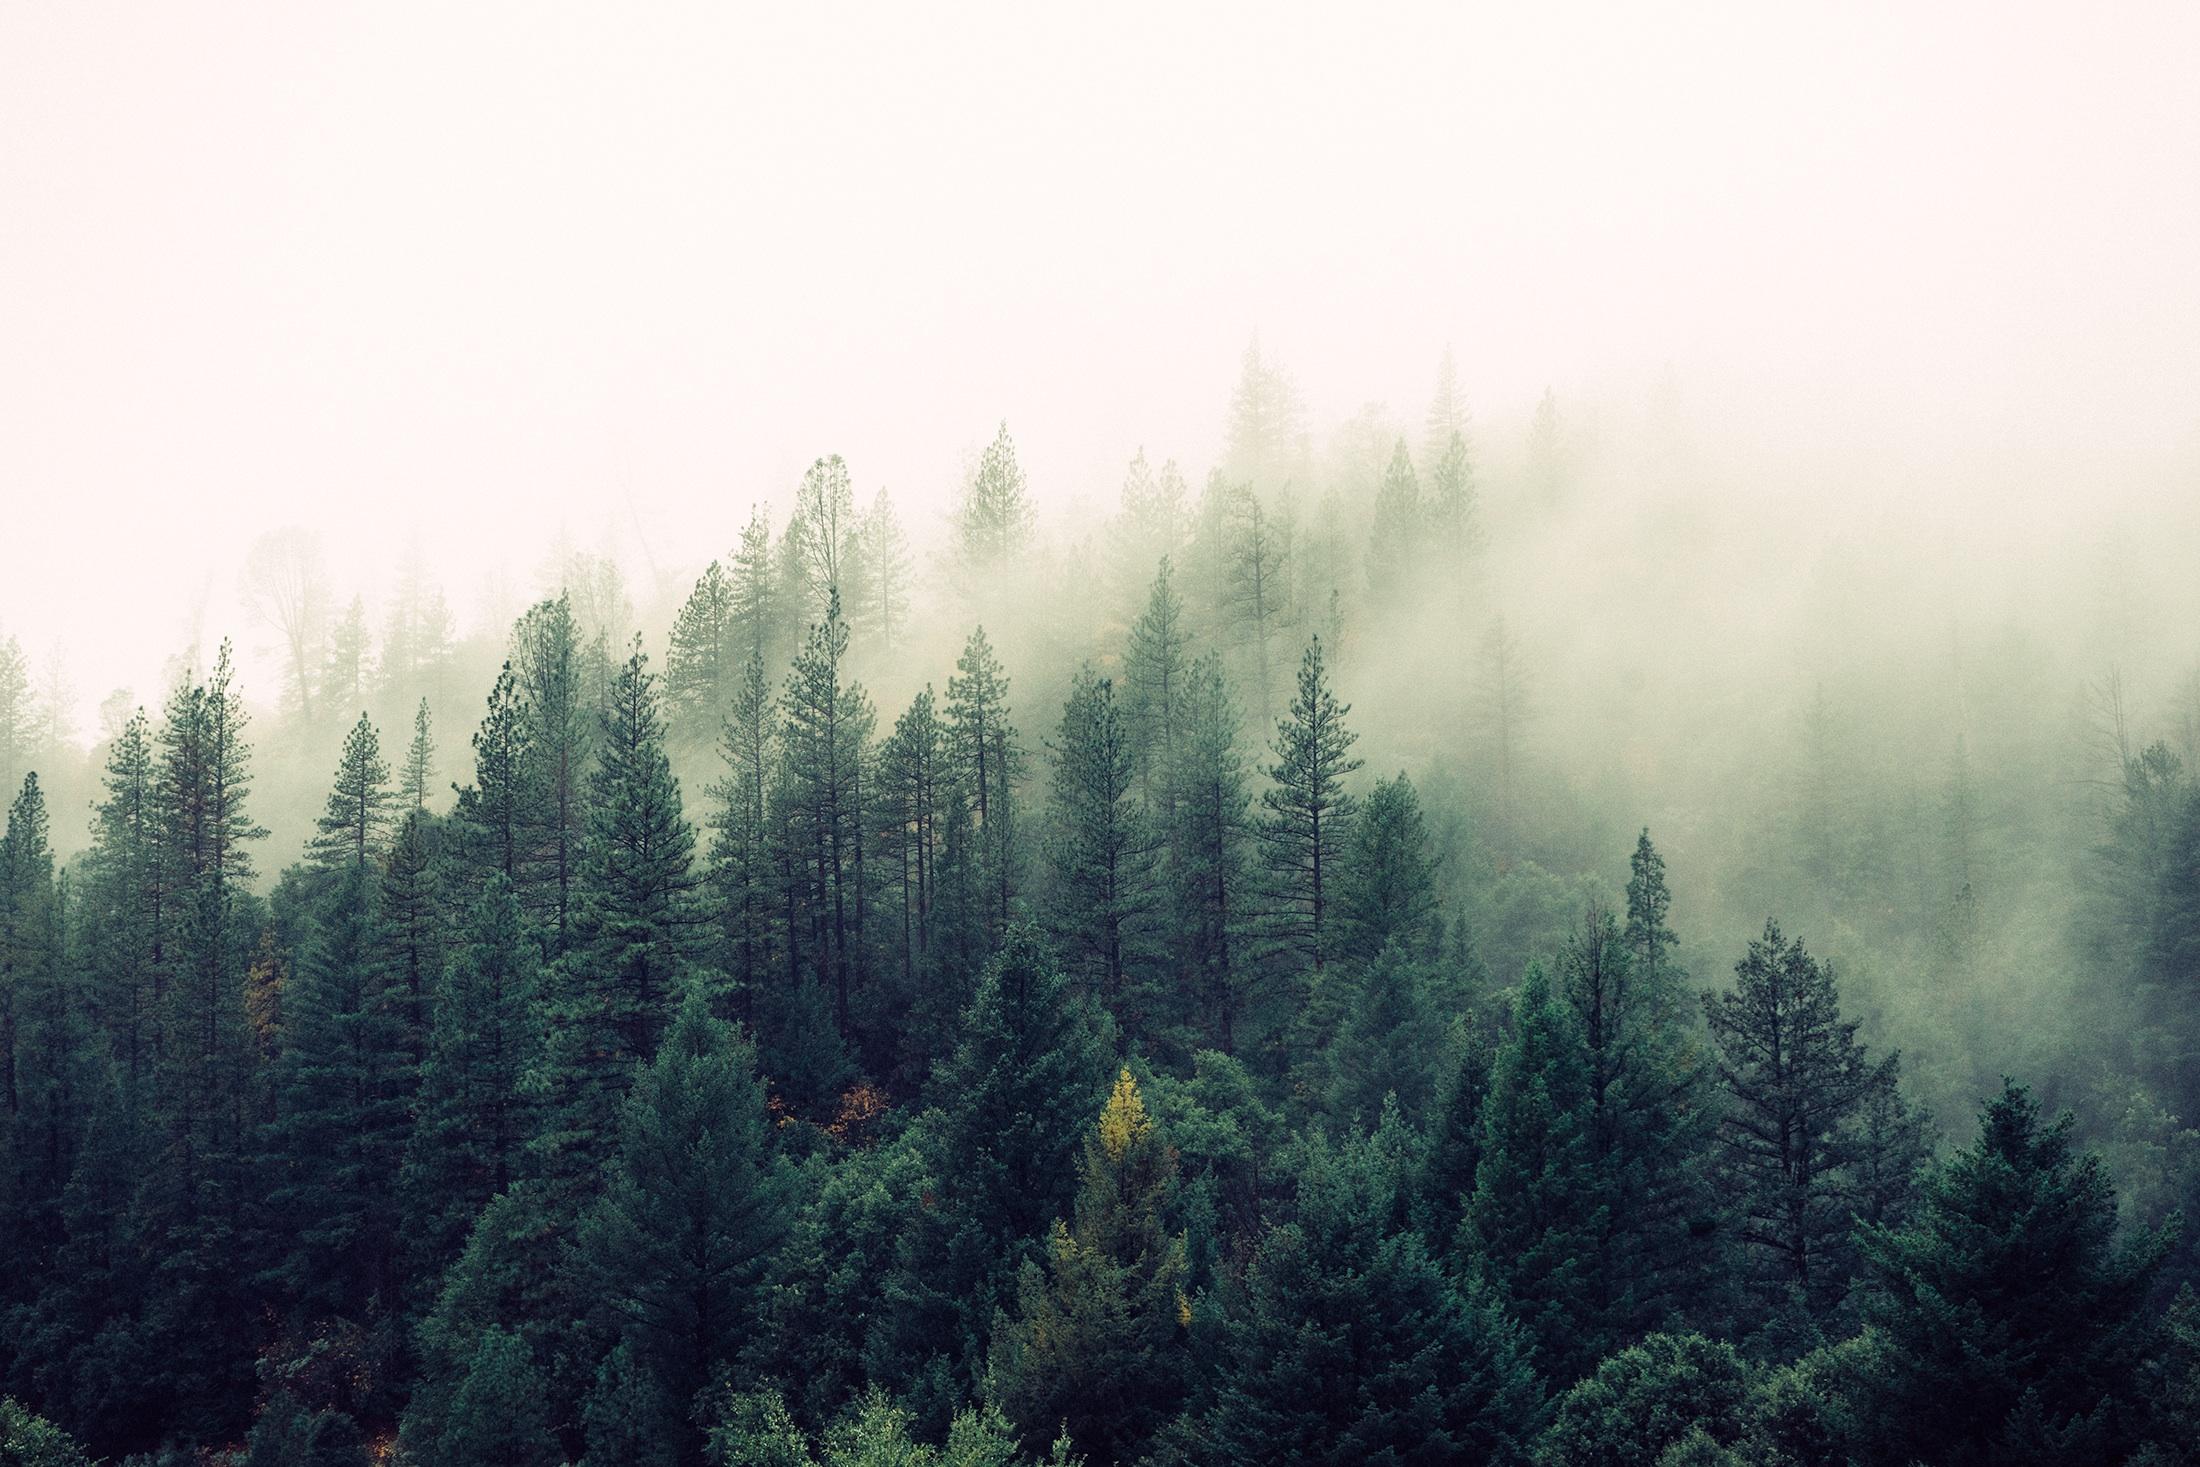 nature-forest-trees-fog (1).jpeg